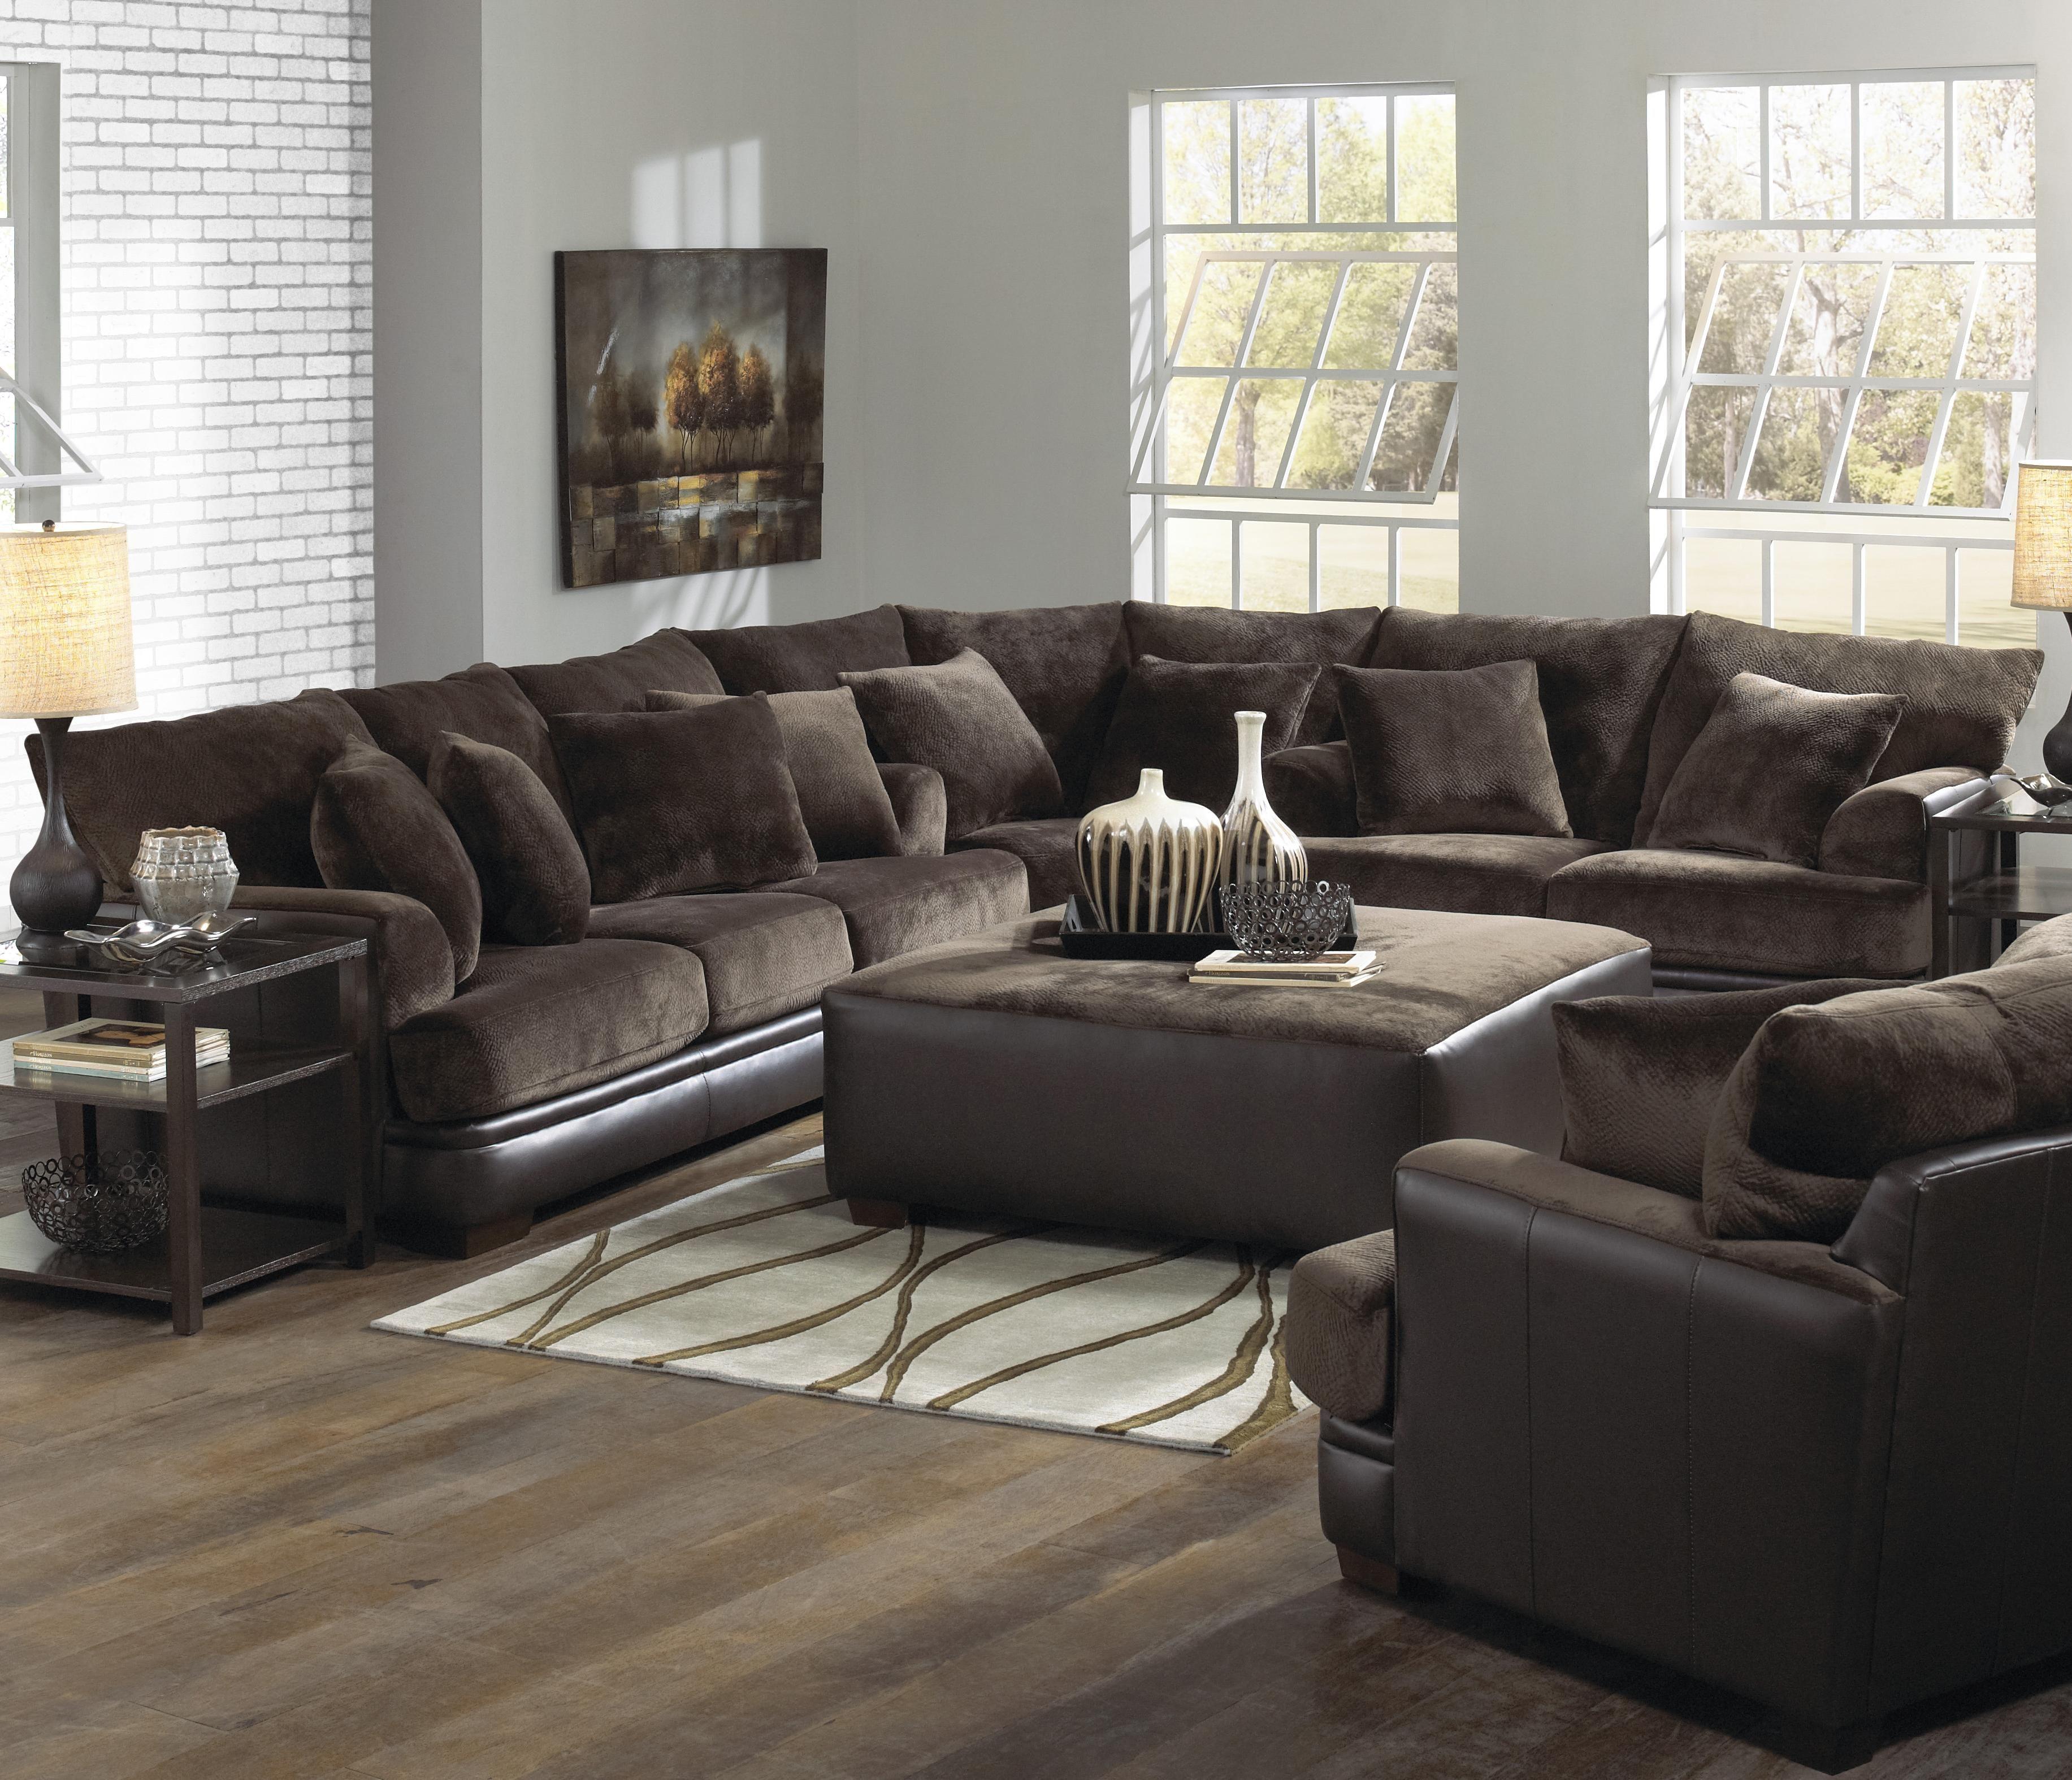 Best Furniture Dark Brown Velvet Couch Plus Black Leather Base 400 x 300